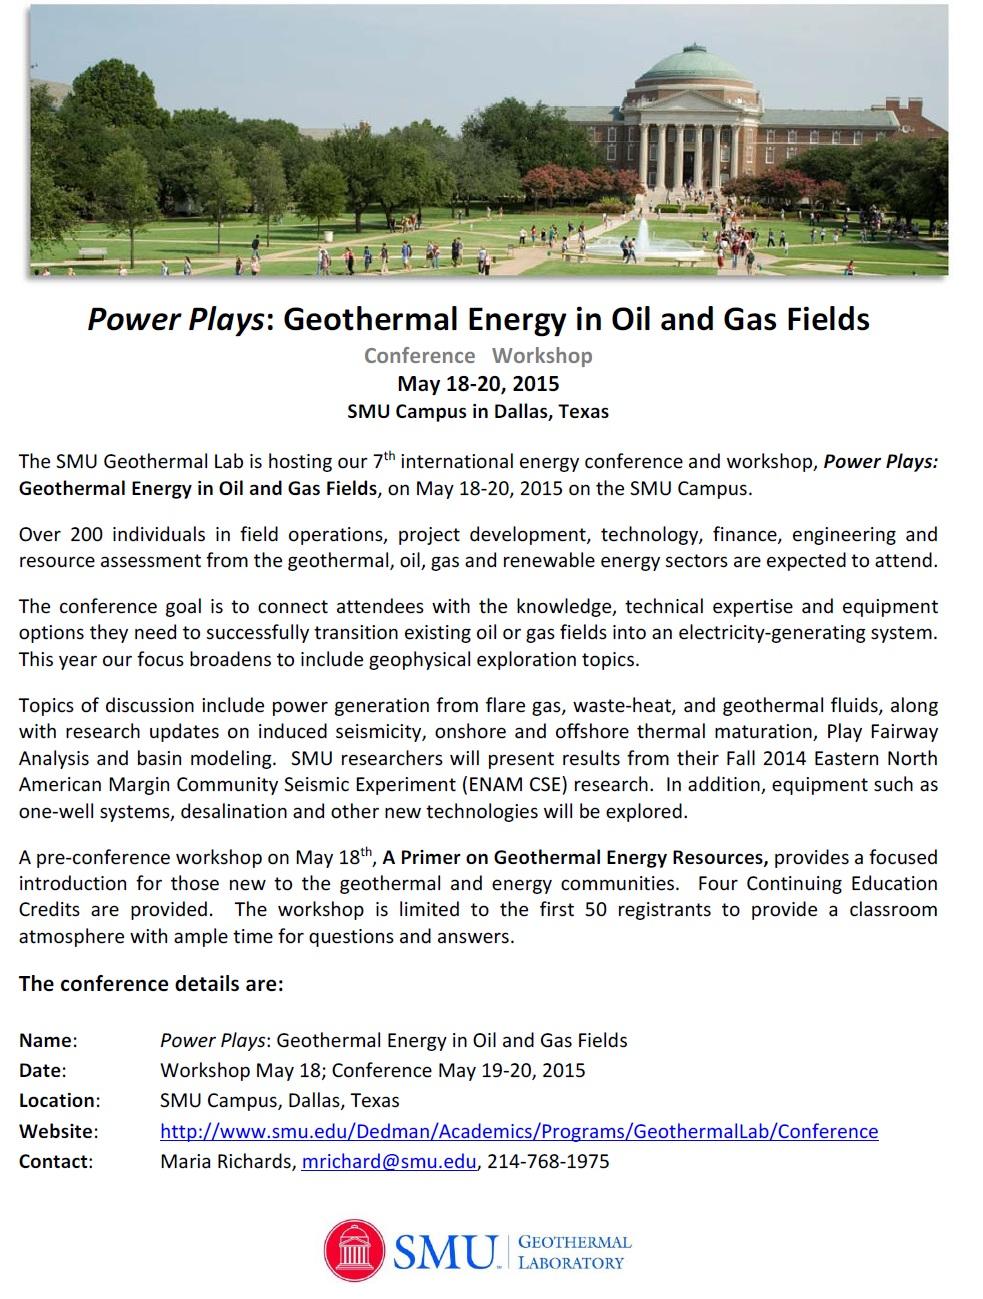 SMU Power Plays Geothermal Energy in Oil and Gas Fields.jpg